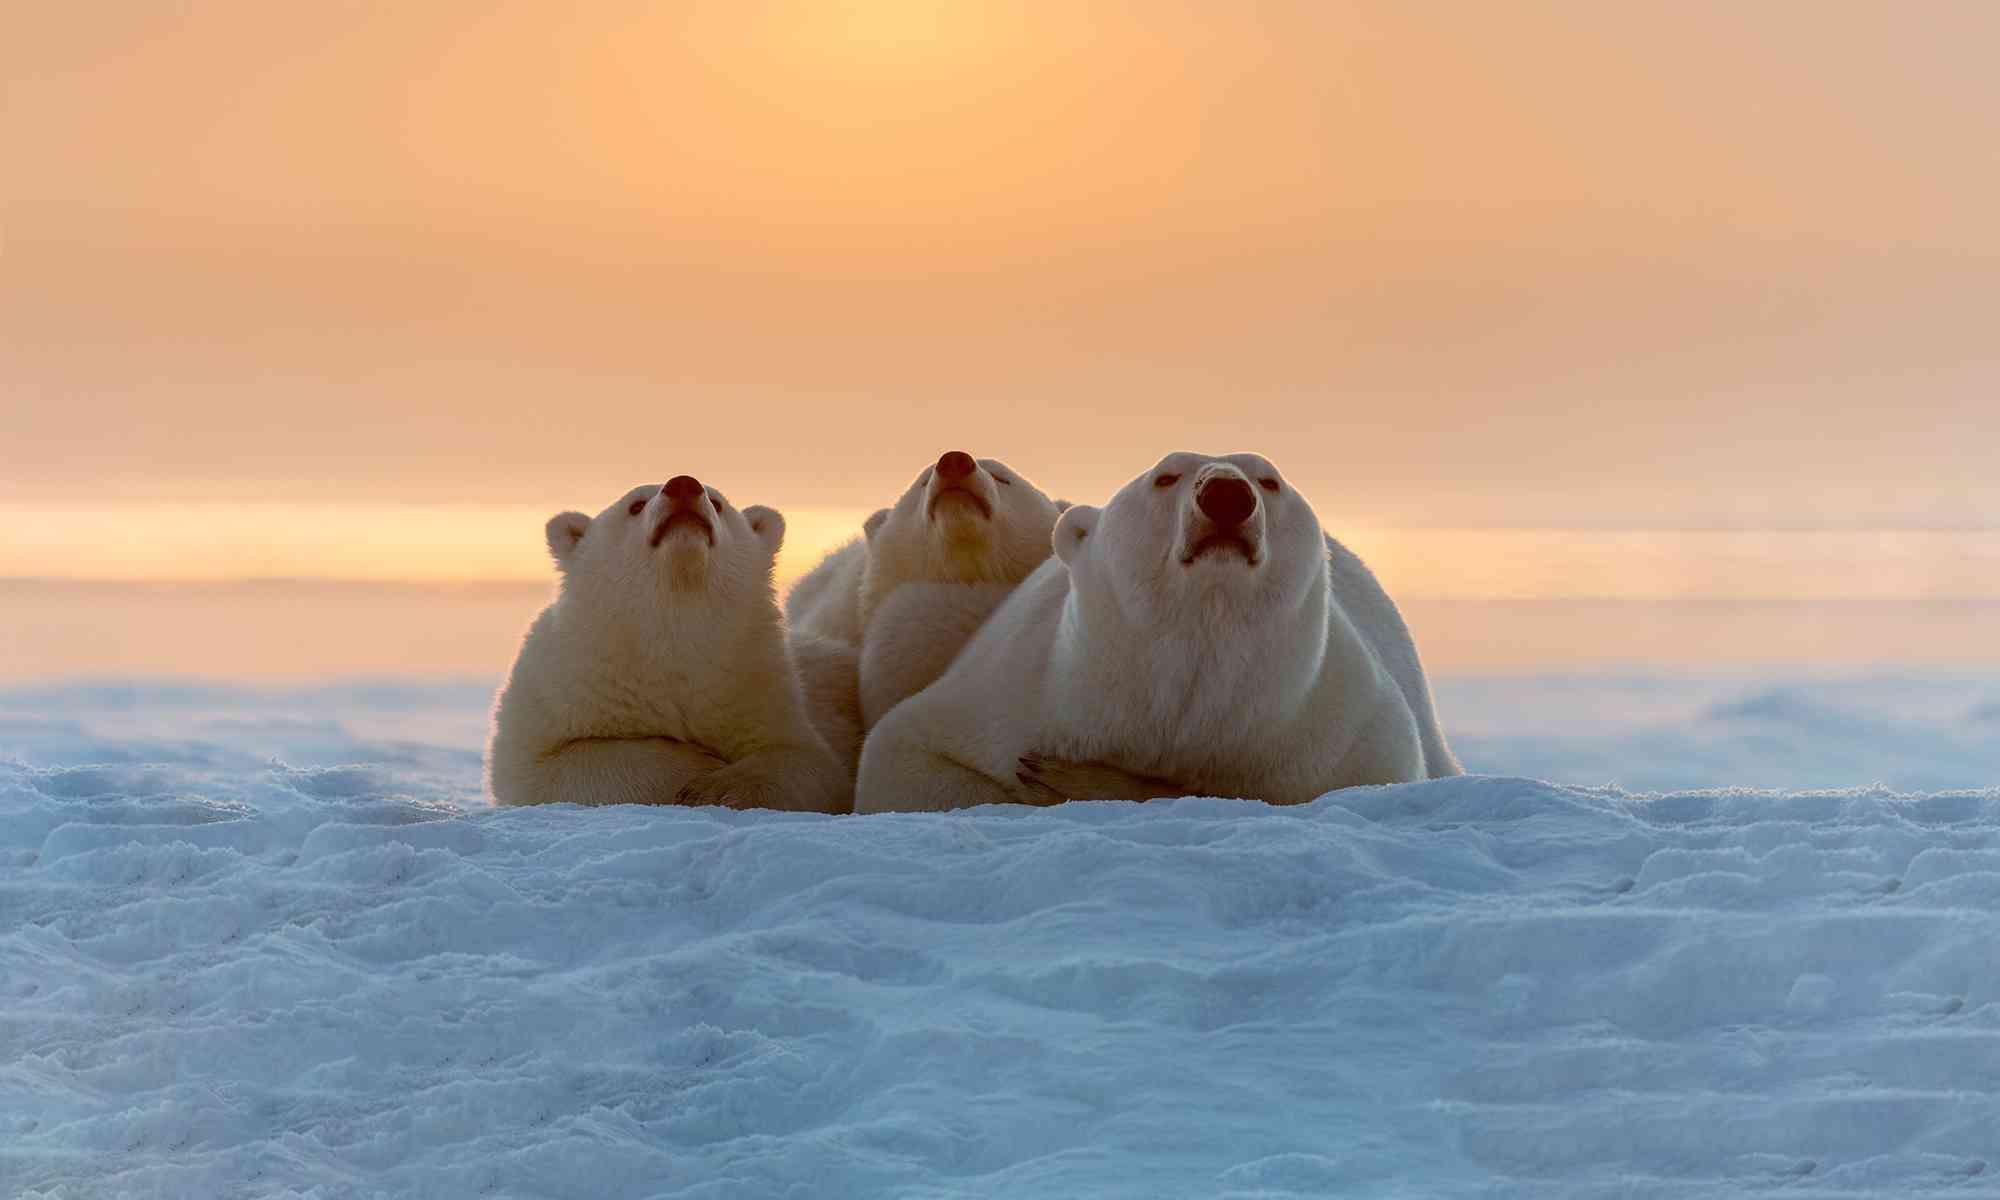 Polar Bear | Defenders of Wildlife on map of polar bear range, map of canada polar bear, where does a polar bear live, maps where brown bears live, spectacled bears live, where do polar bears live, where does the polar bear live, map of where kodiak bears live, polar bear camera live, where do squids live, how long can polar bears live, where does an aardvark live, map of polar bear habitat, map of younger dryas, how long do bears live, a map of where bears live, wear do polar bears live, description of where polar bears live, diagram of where polar bears live, map where black bears live,